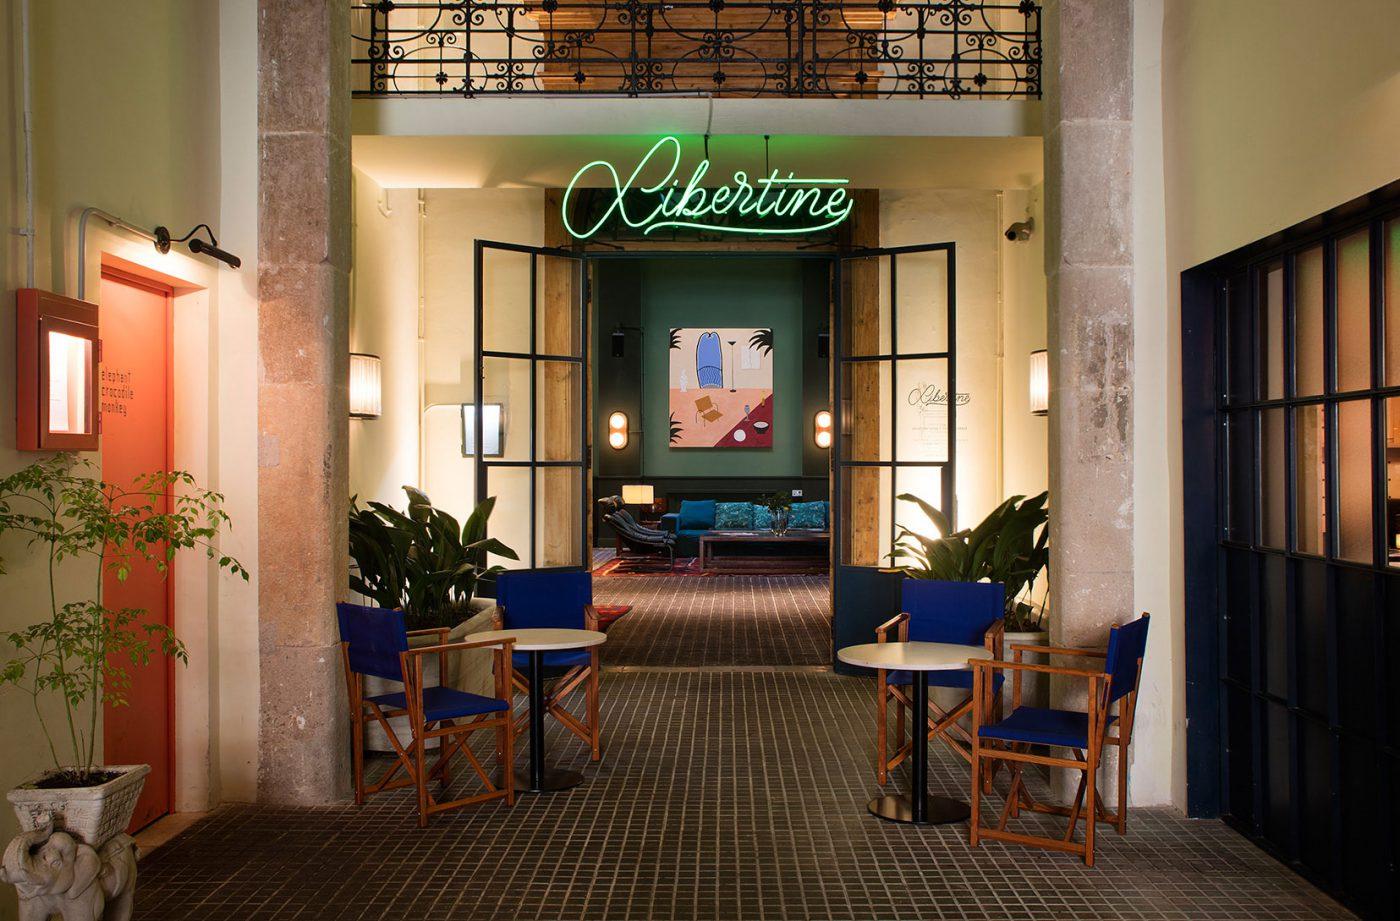 casa-bonay-barcelona-dining-drinks-libertine-lounge-01-1400x921.jpg